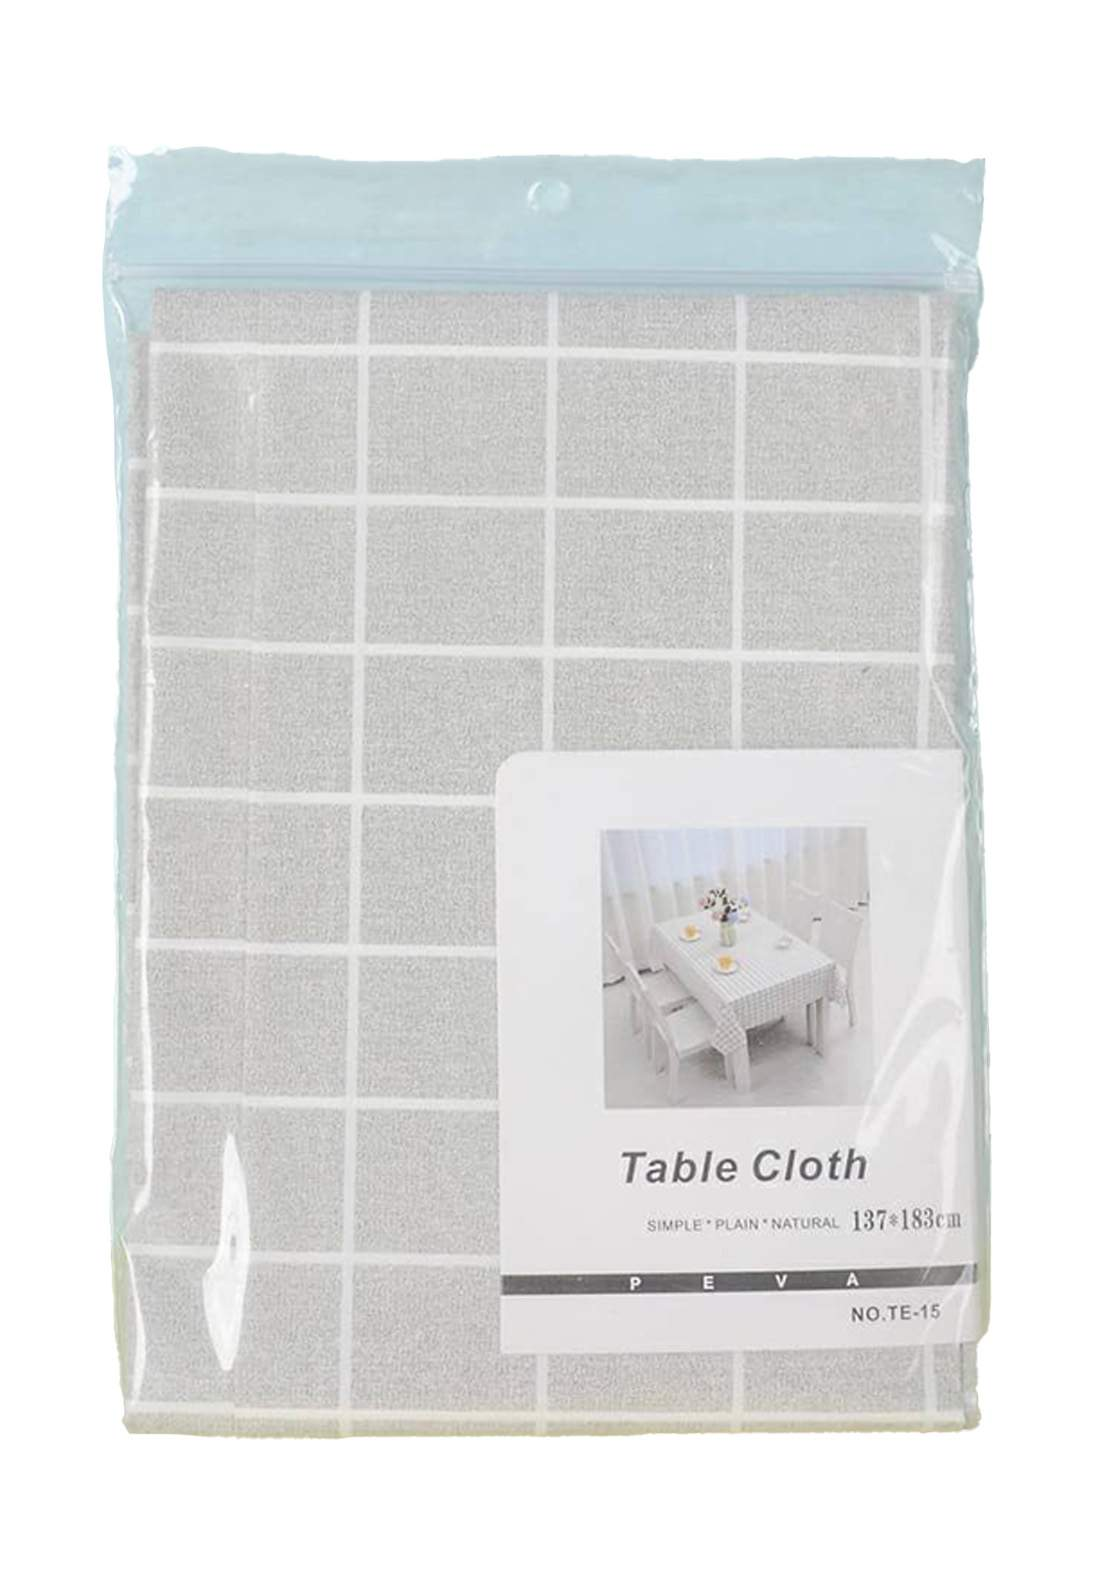 Nordic plaid waterproof tablecloth مفرش طاولة